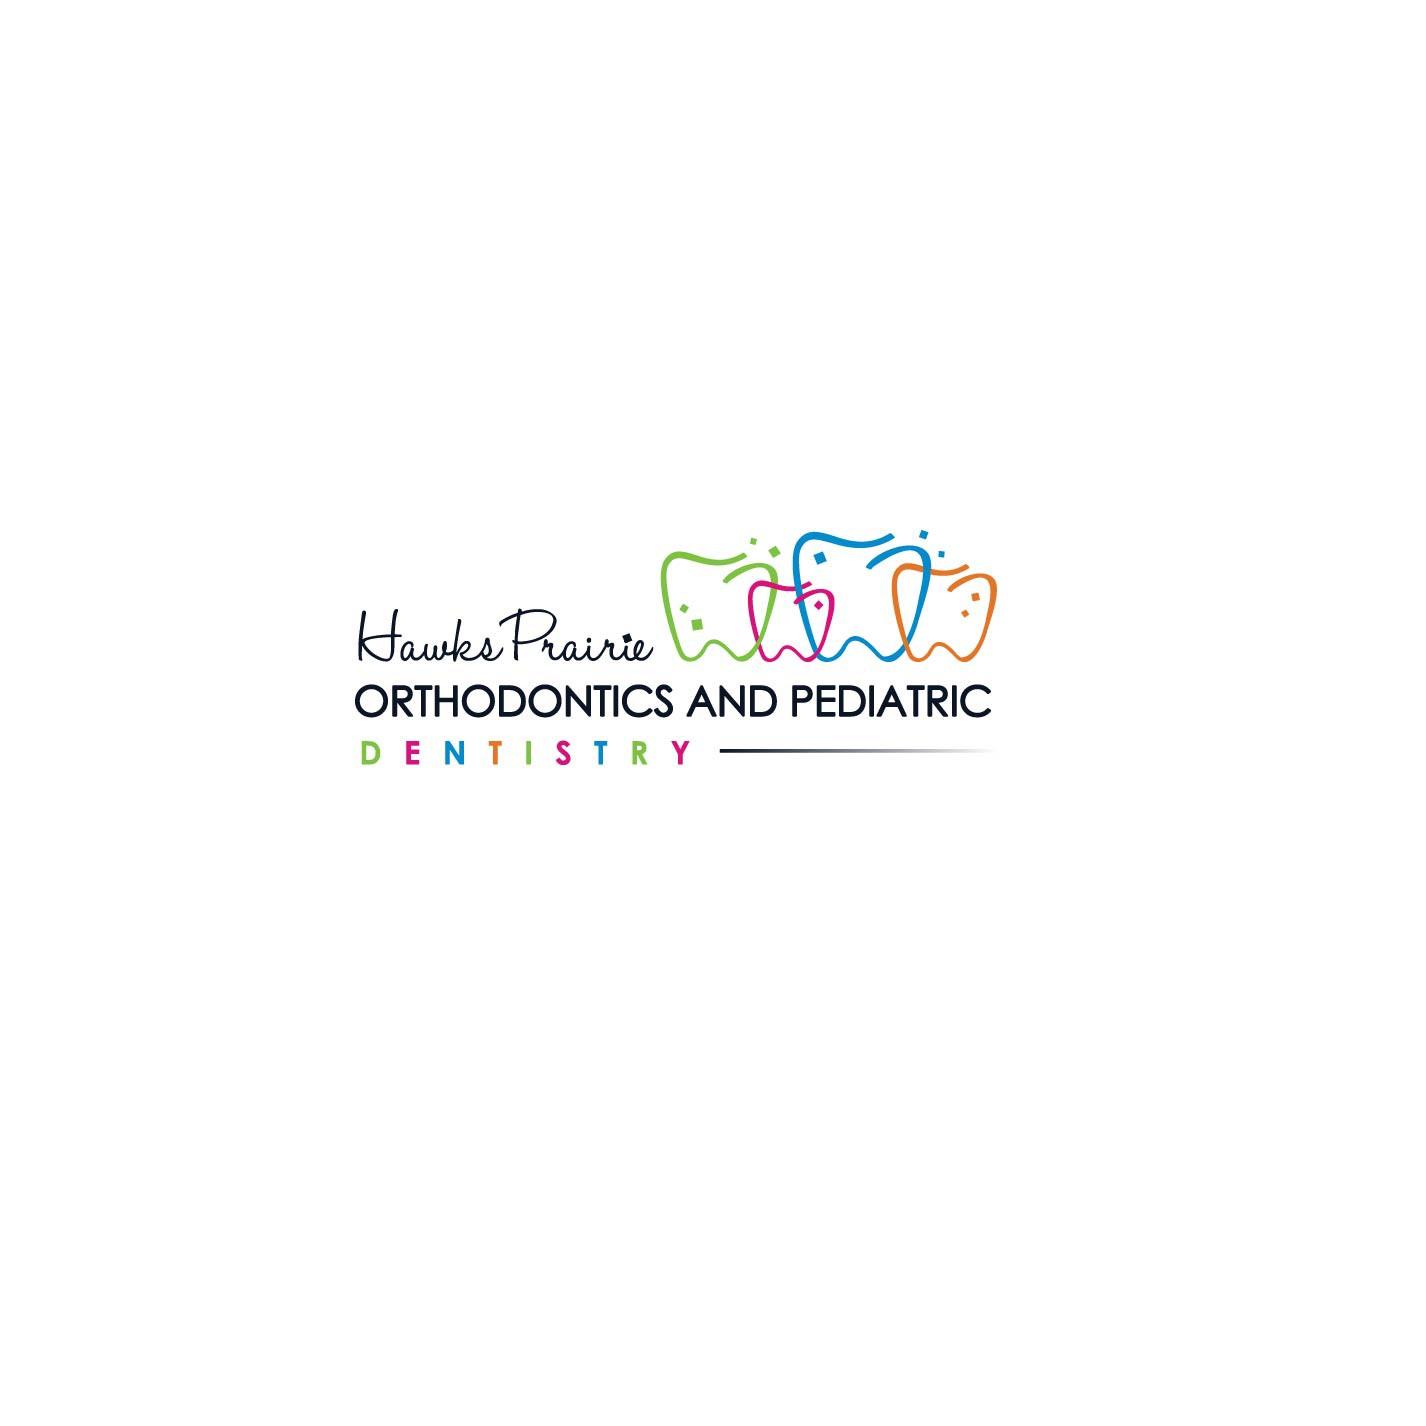 Design a FUN & modern building sign/logo for an Orthodontist/Kids Dentist!!!